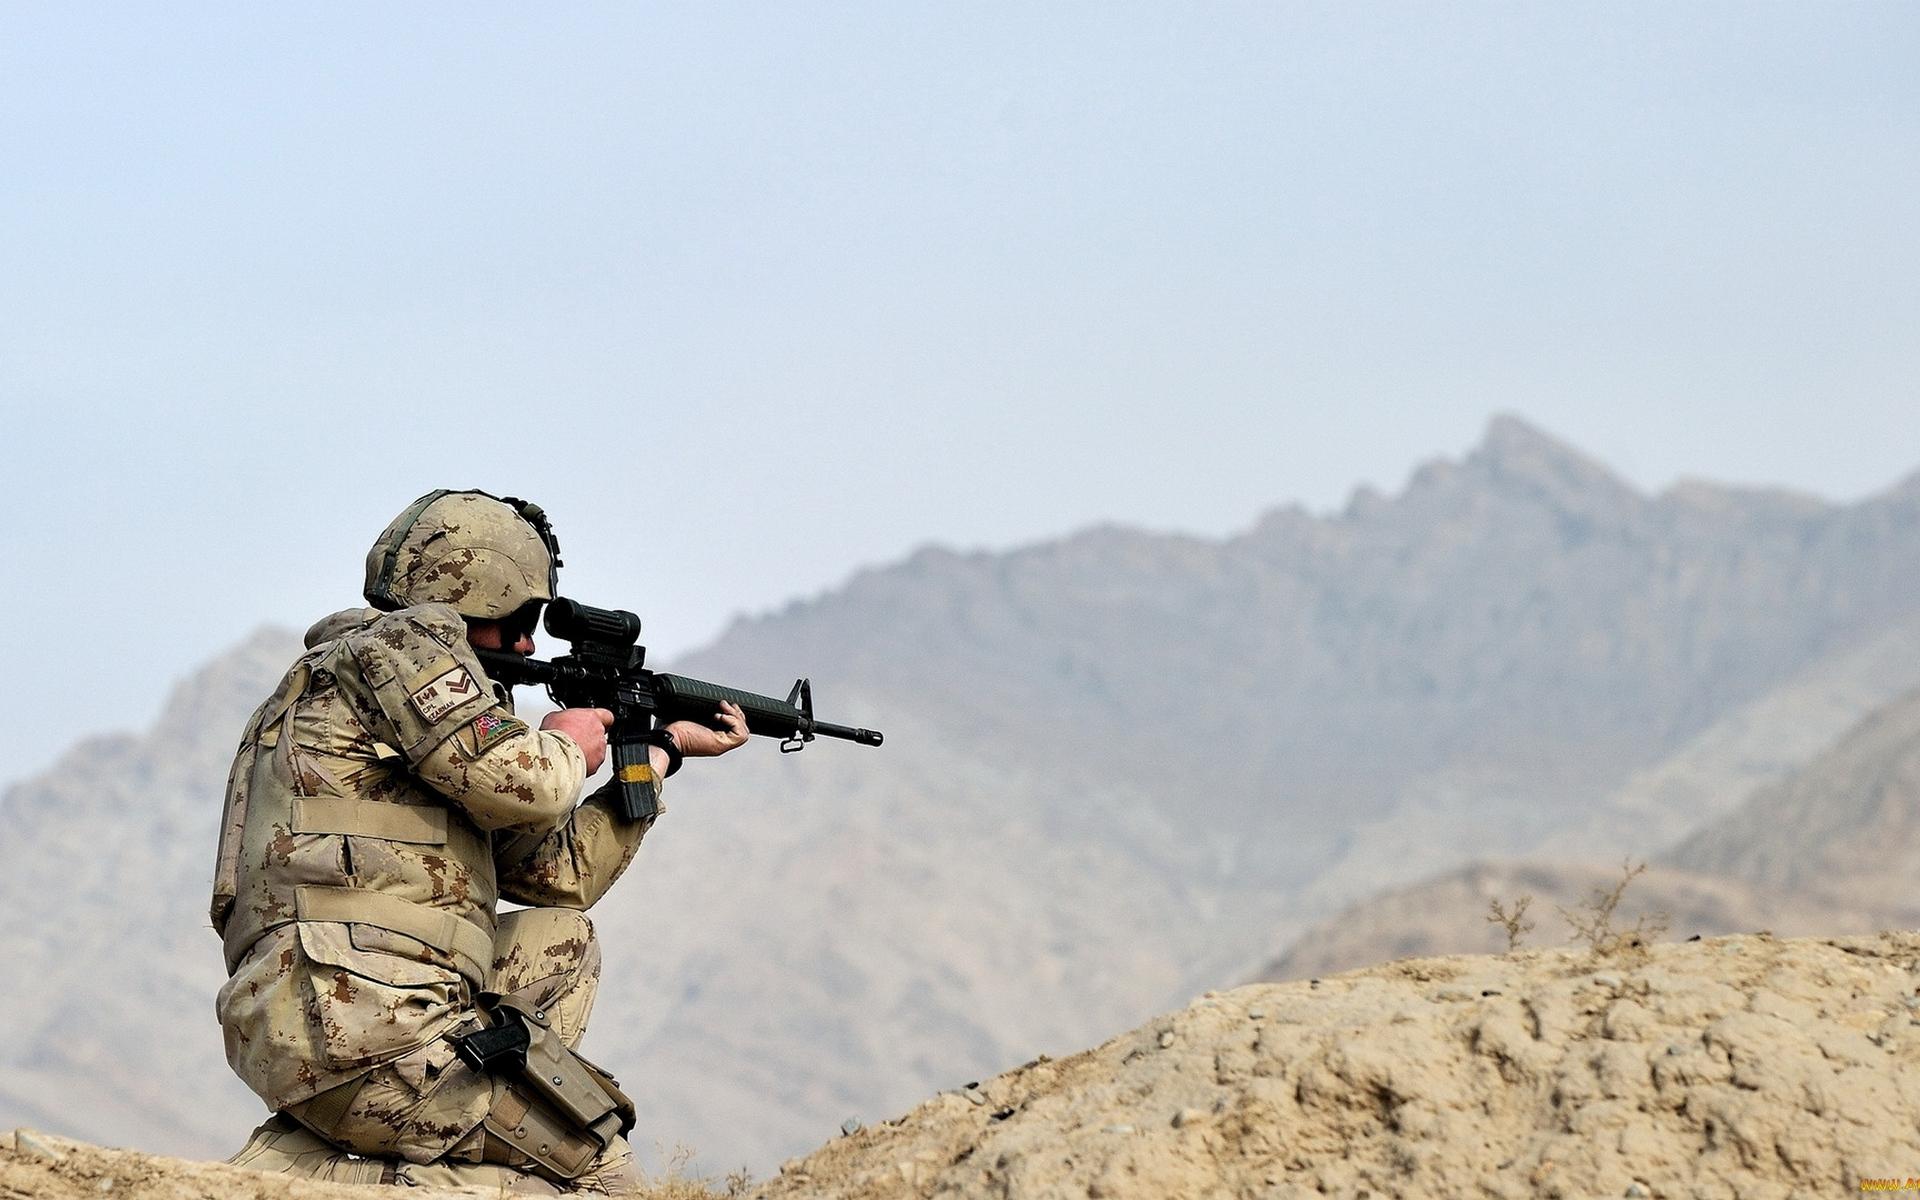 солдат, амуниция, шлем